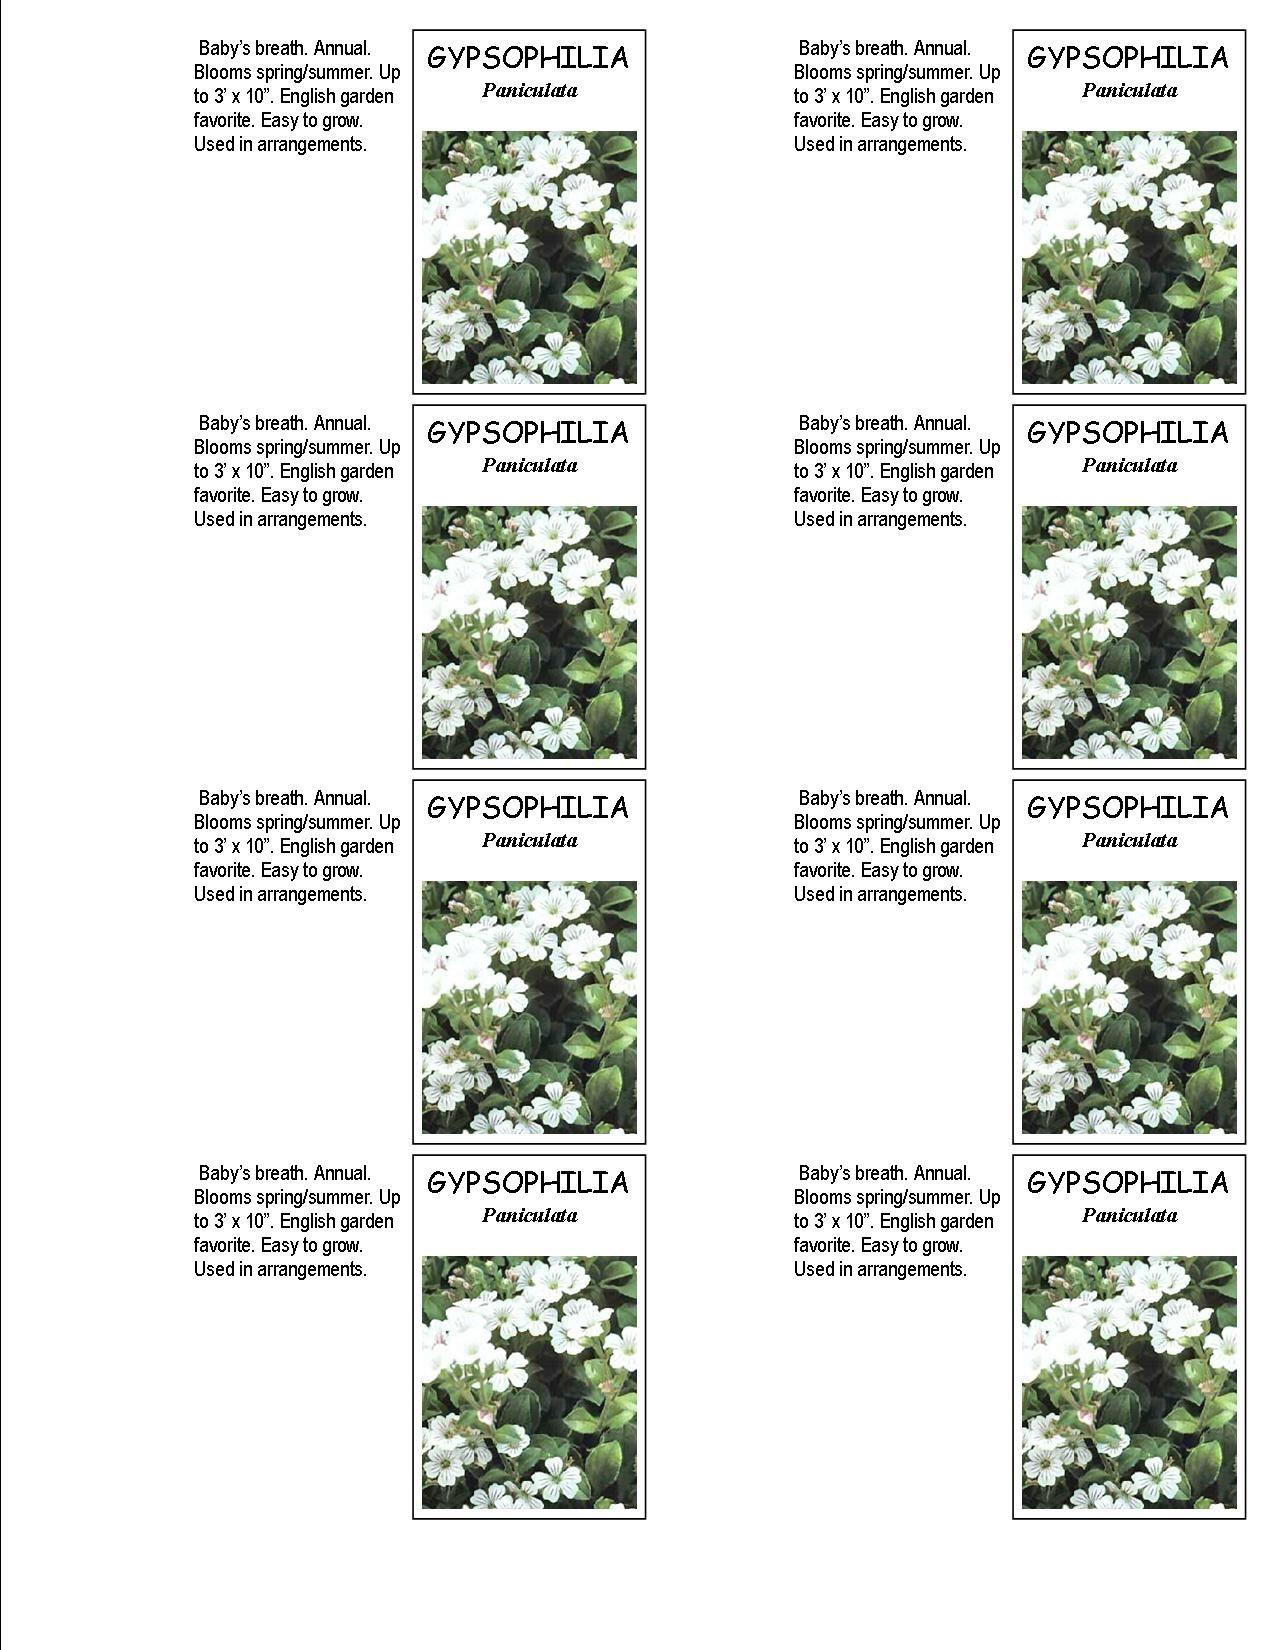 Gypsophilia Baby S Breath Seed Envelopes Babys Breath Flower Garden English Garden